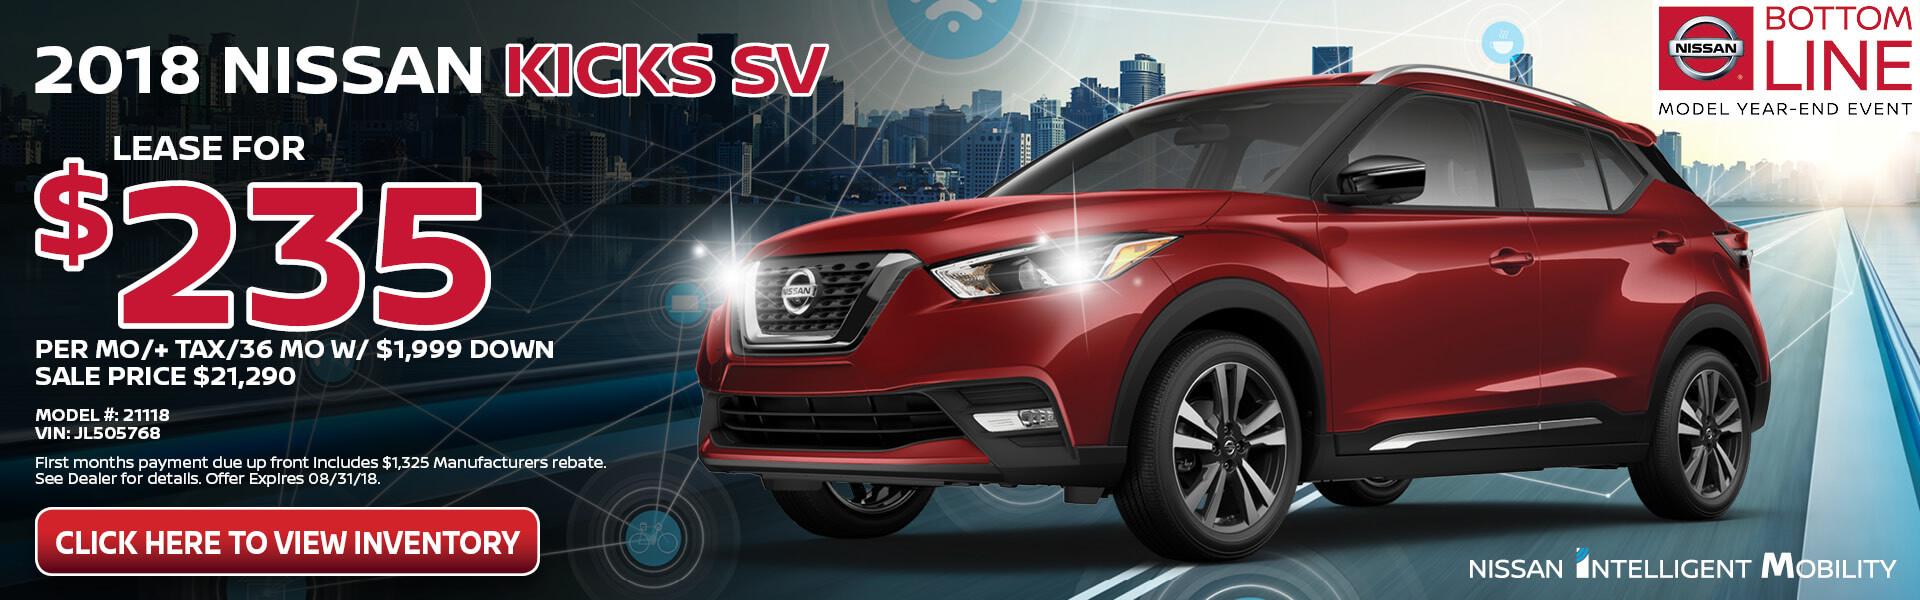 Nissan Kicks $235 Lease